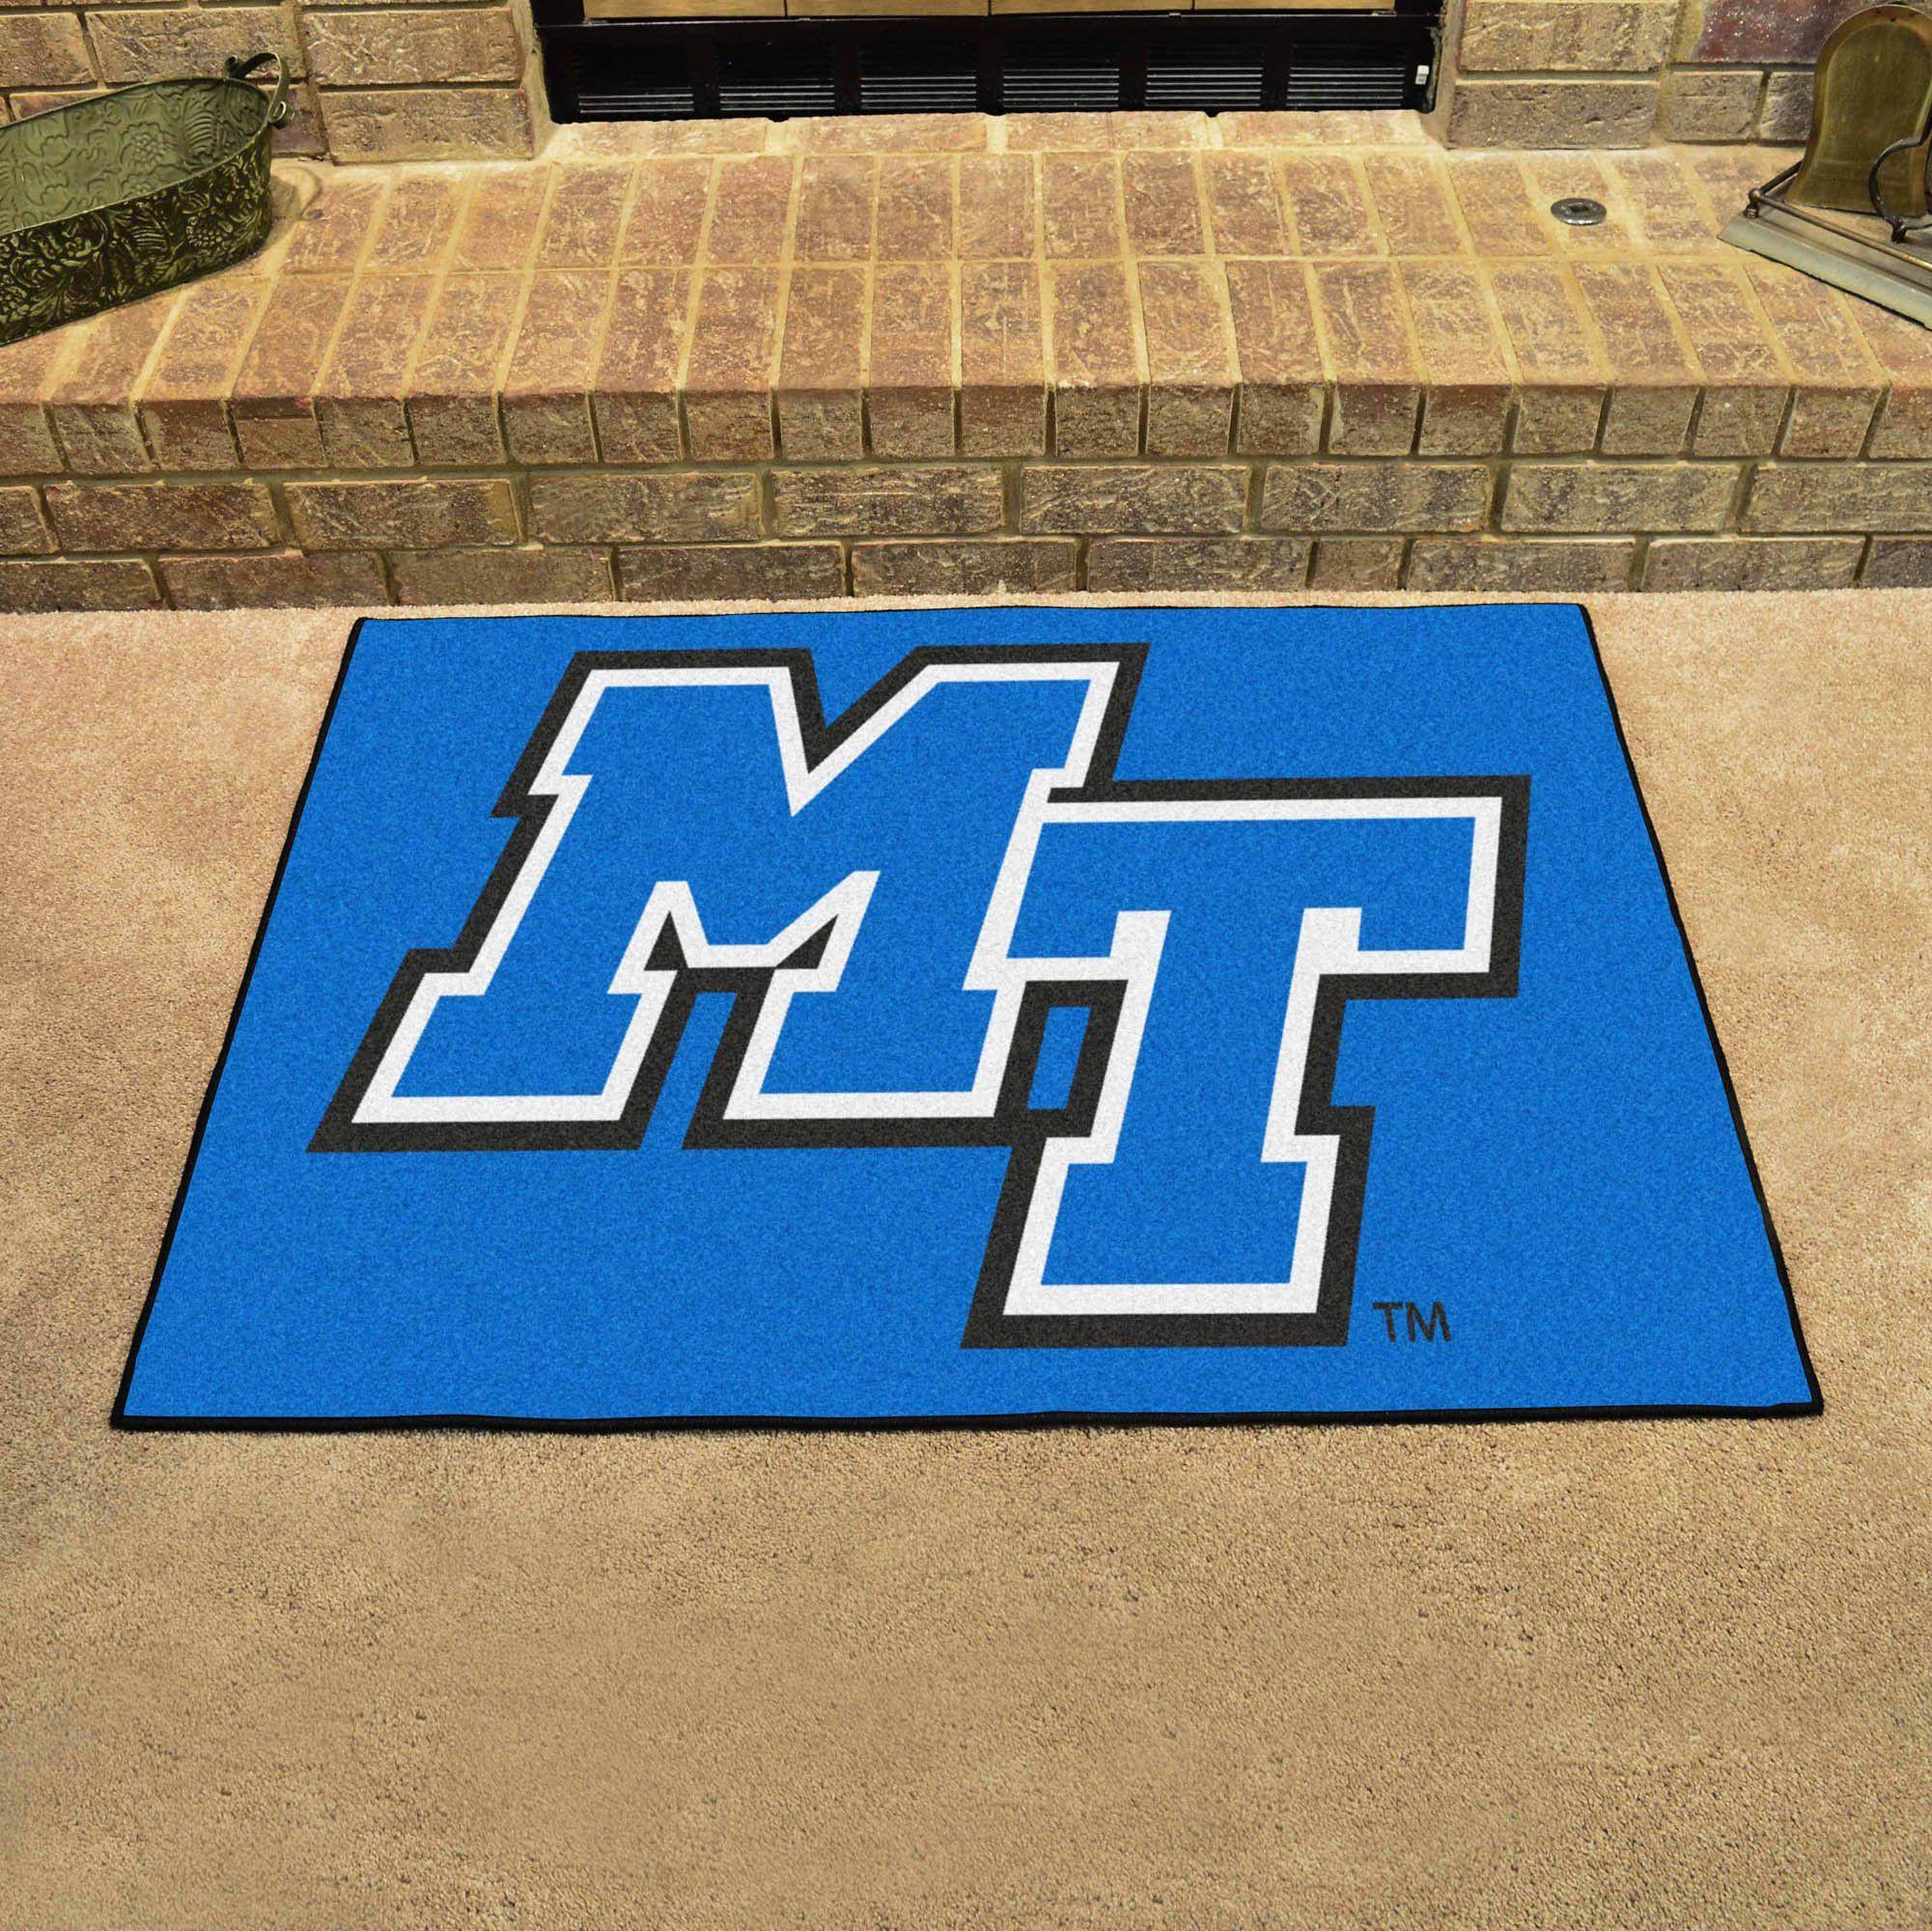 Middle Tennessee State All Star Mat 33 75 X42 5 Floor Rugs University Of Kentucky Kentucky